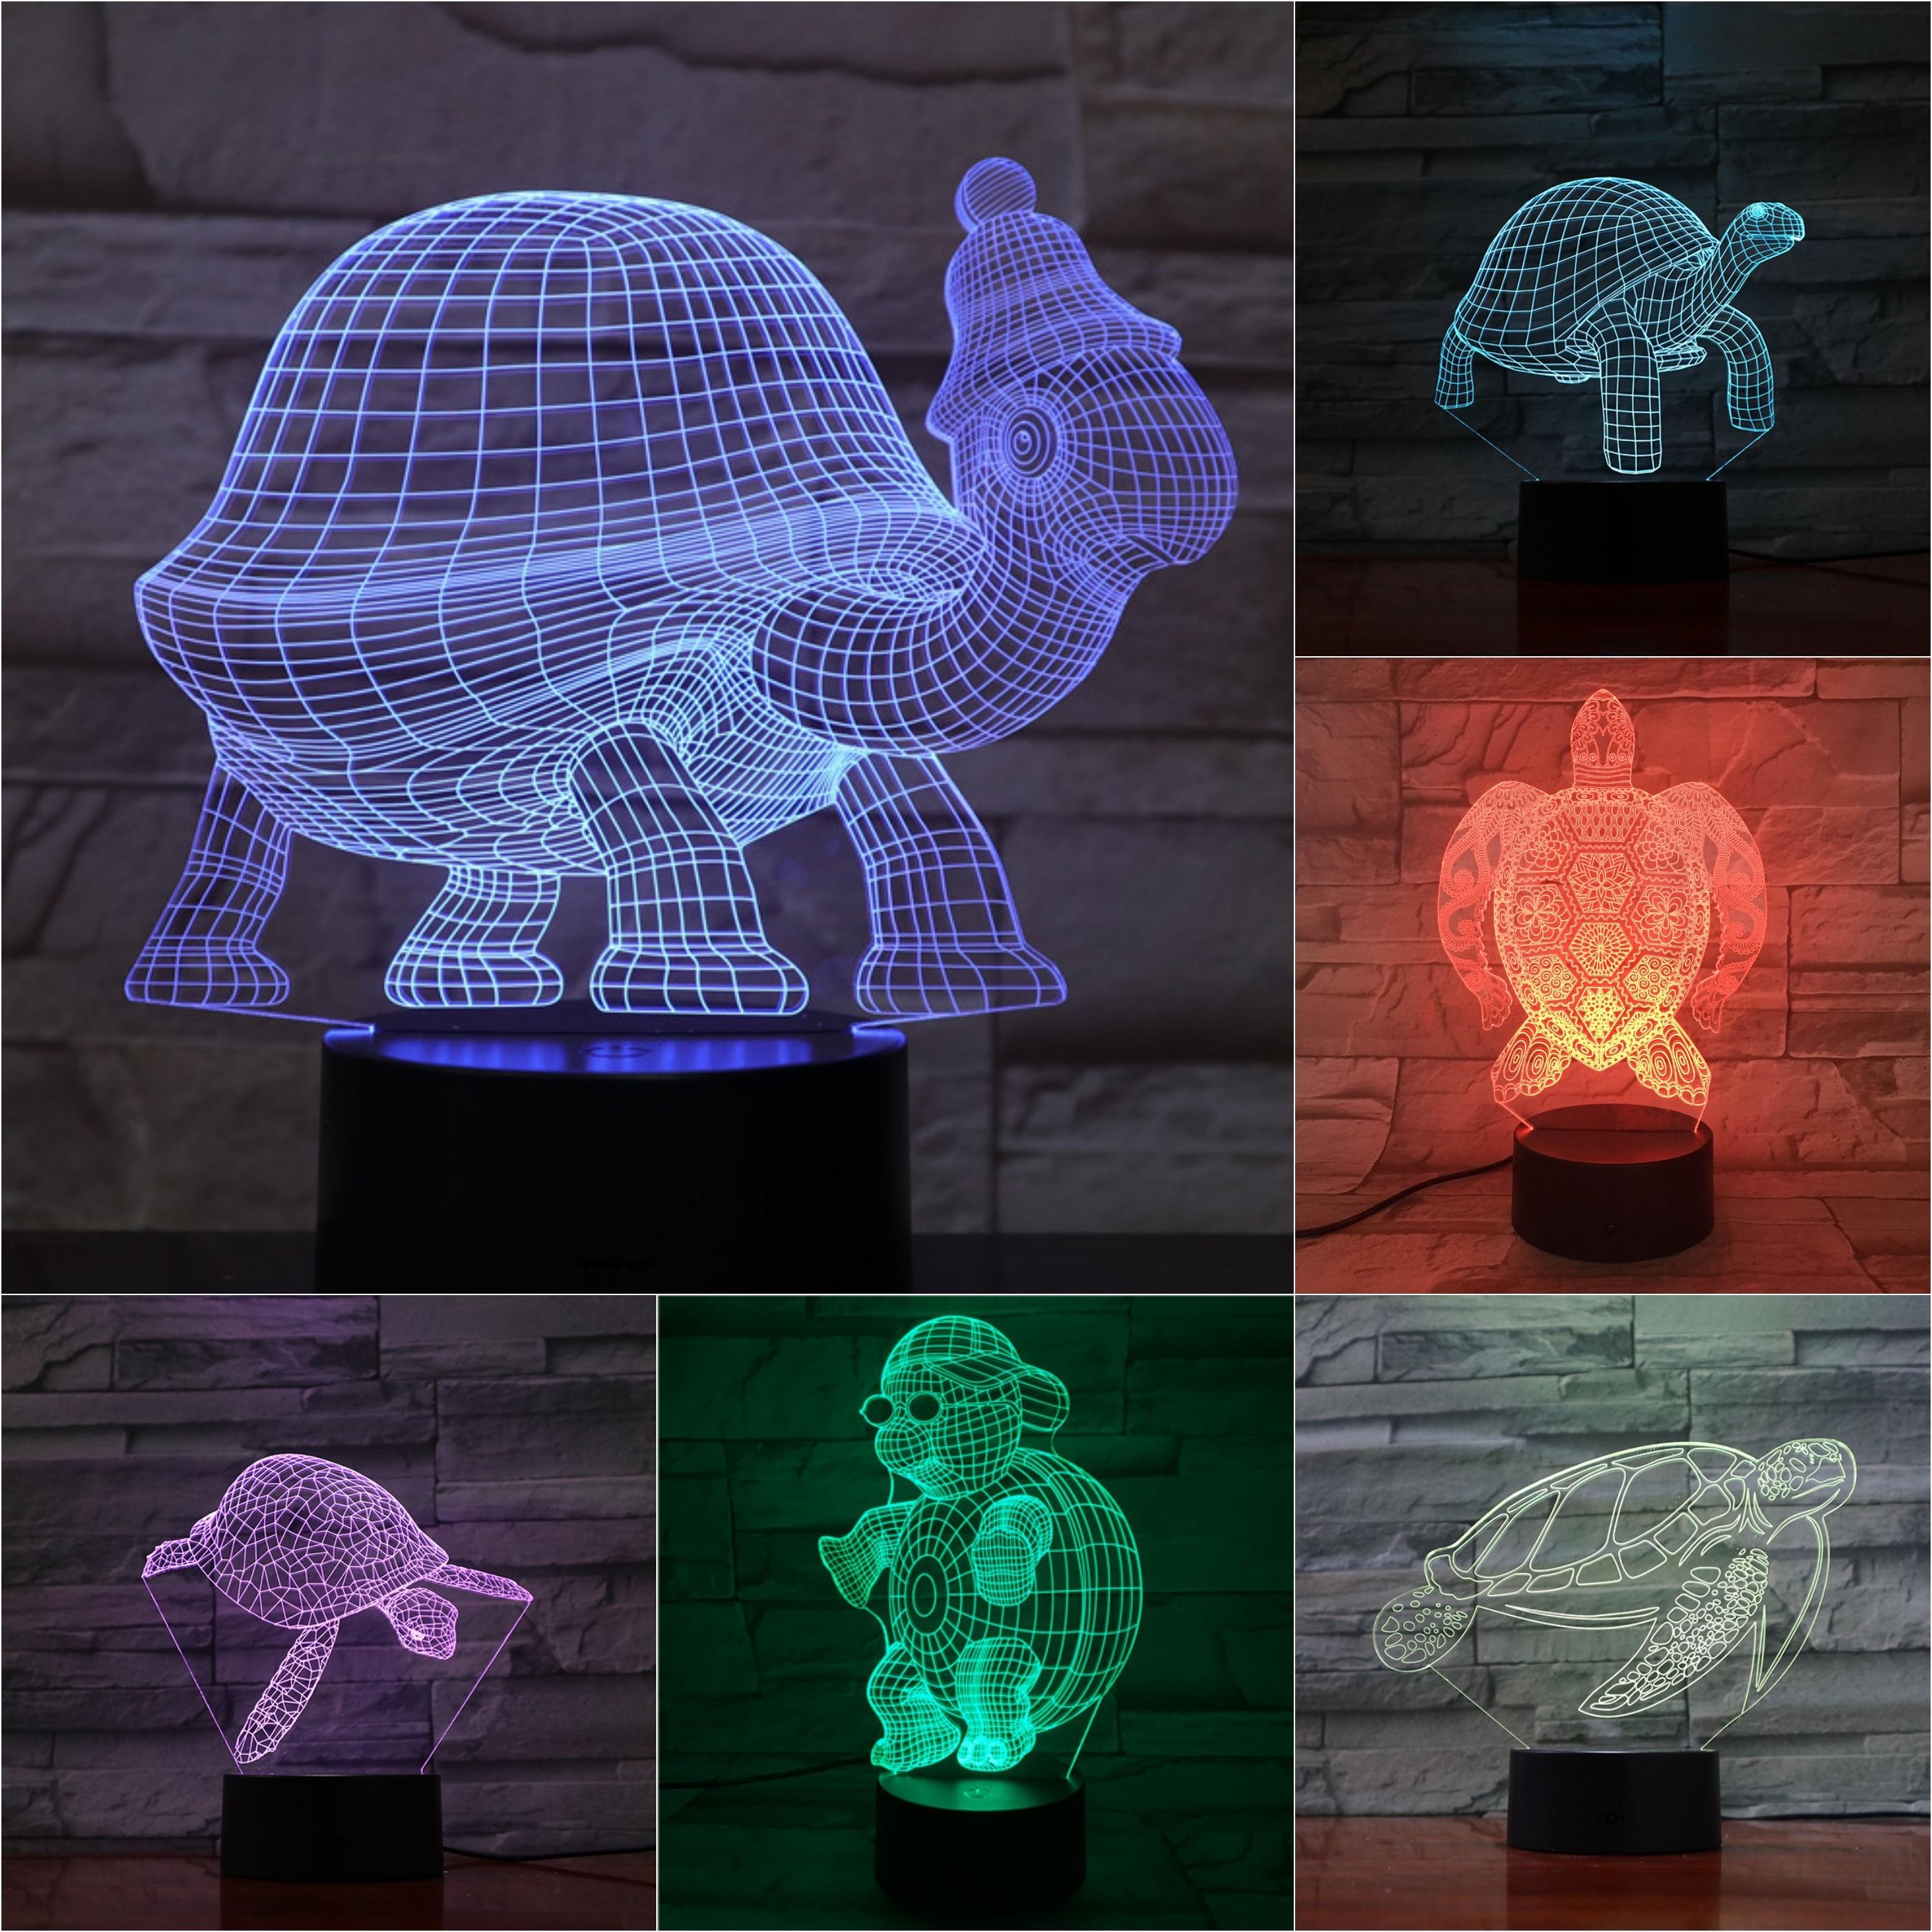 Animal Tortoise 3D Lamp Touch Sensor 7 Color Changing Decorative Lamp Children Kids Baby Kit Nightlight Turtle Led Night LightAnimal Tortoise 3D Lamp Touch Sensor 7 Color Changing Decorative Lamp Children Kids Baby Kit Nightlight Turtle Led Night Light